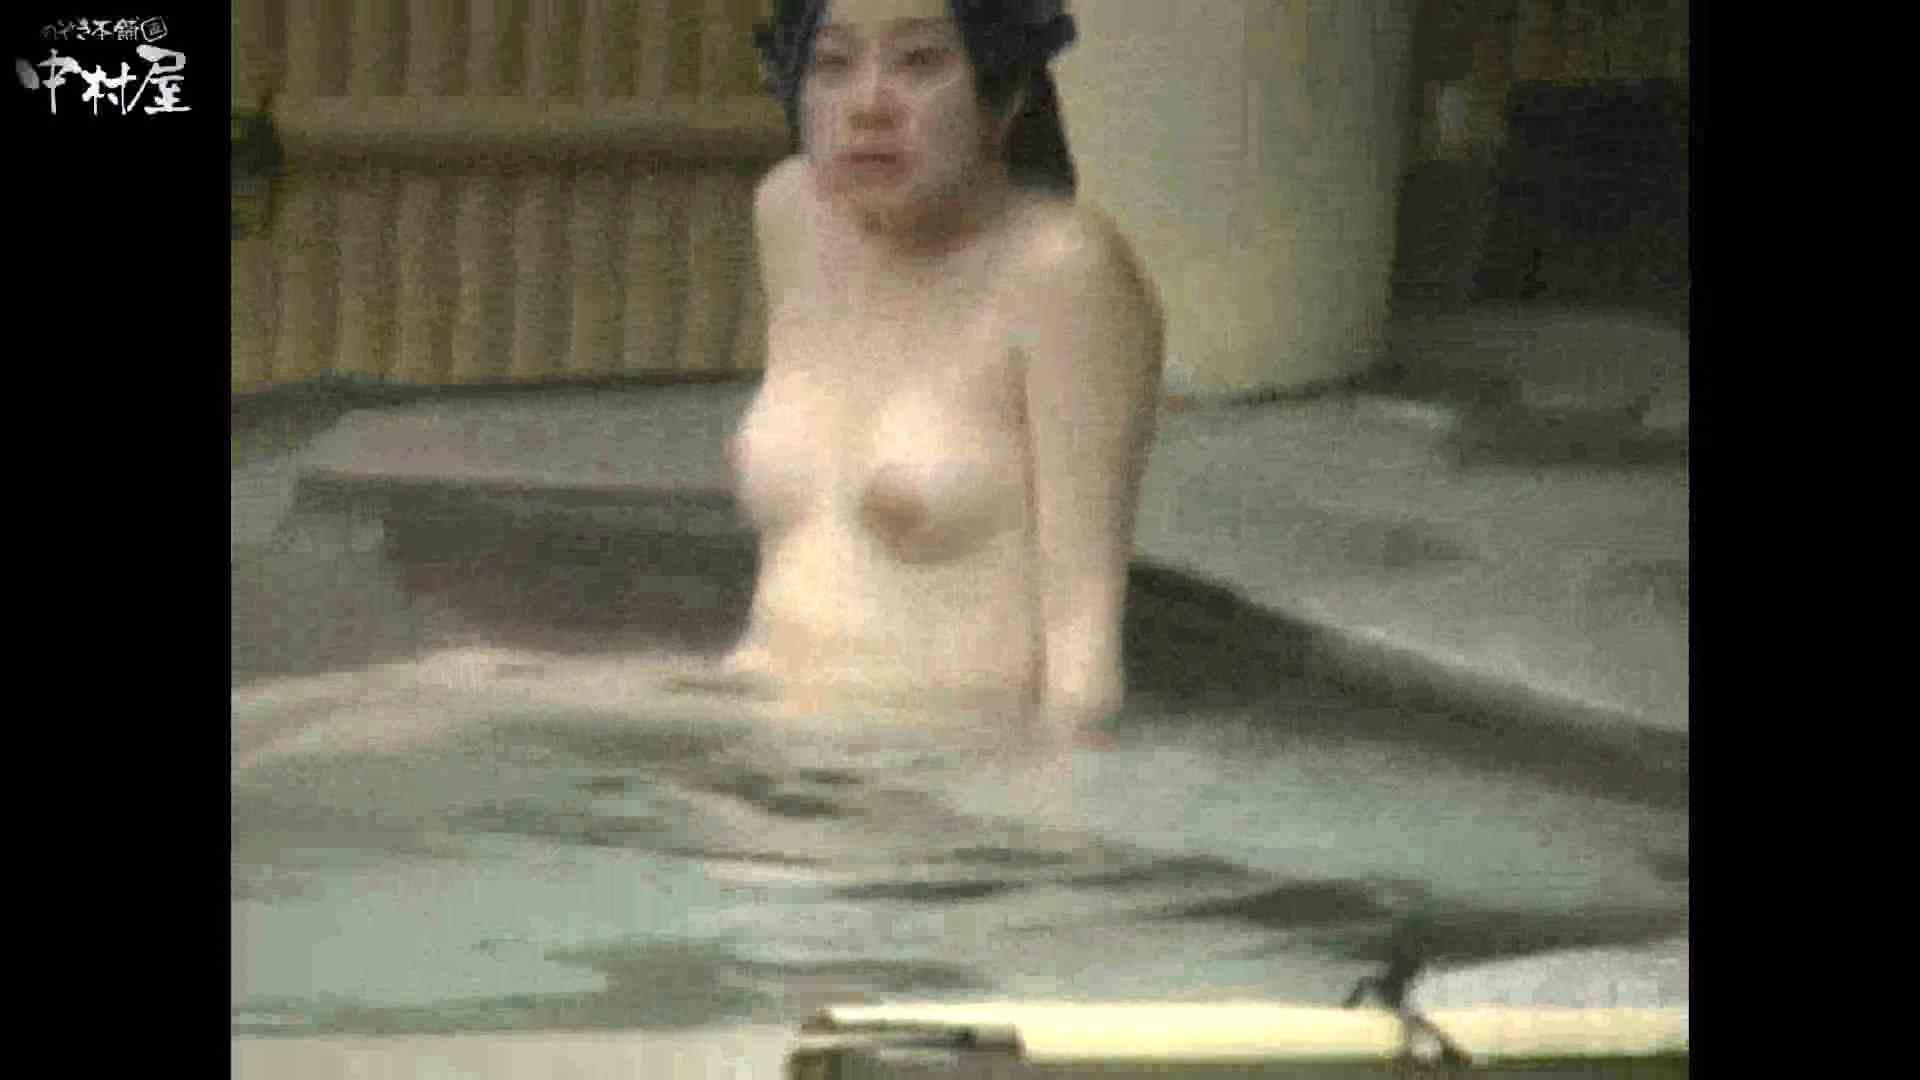 Aquaな露天風呂Vol.878潜入盗撮露天風呂十五判湯 其の三 潜入シリーズ   露天  70pic 23